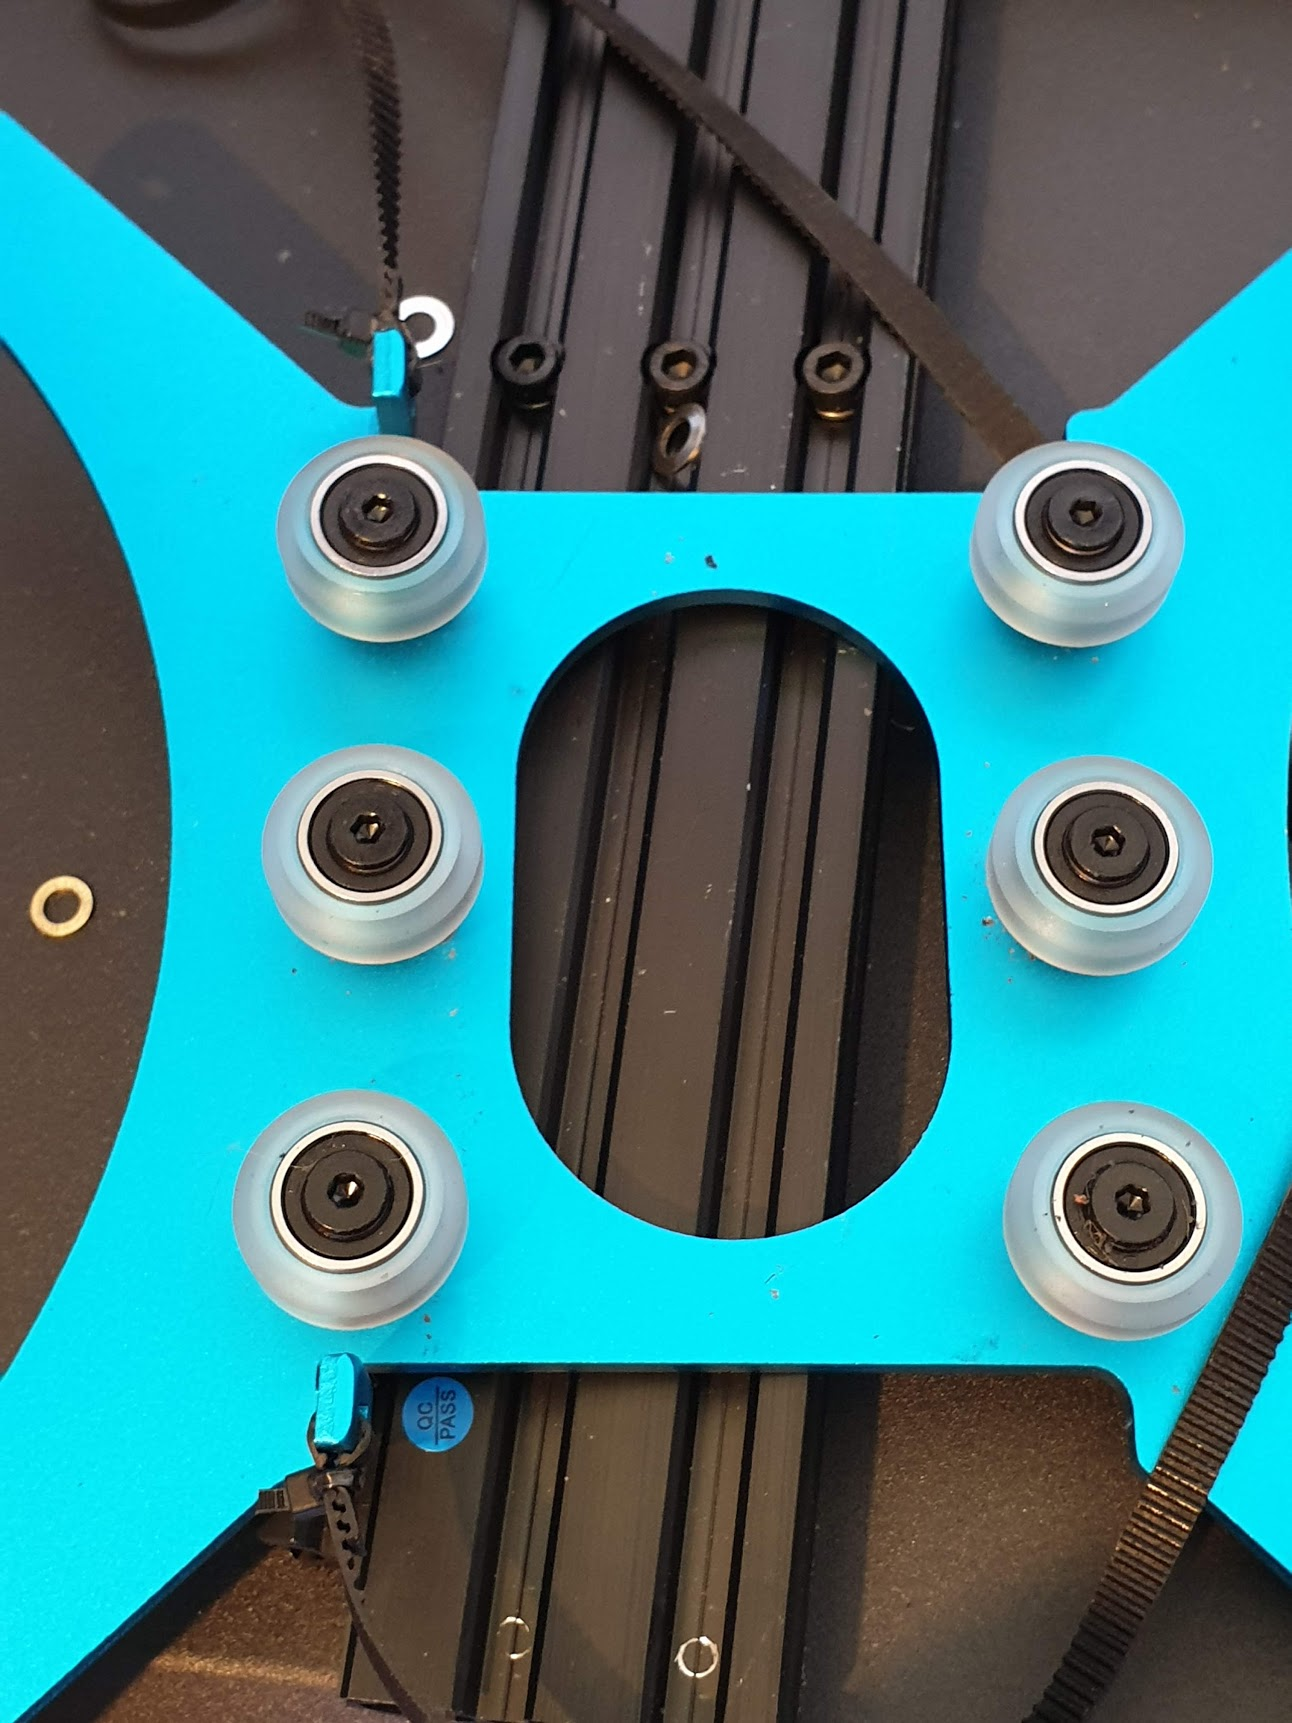 Polycarbonate-V-Slot-Wheels-Sidewinder-X1-upgrades-1